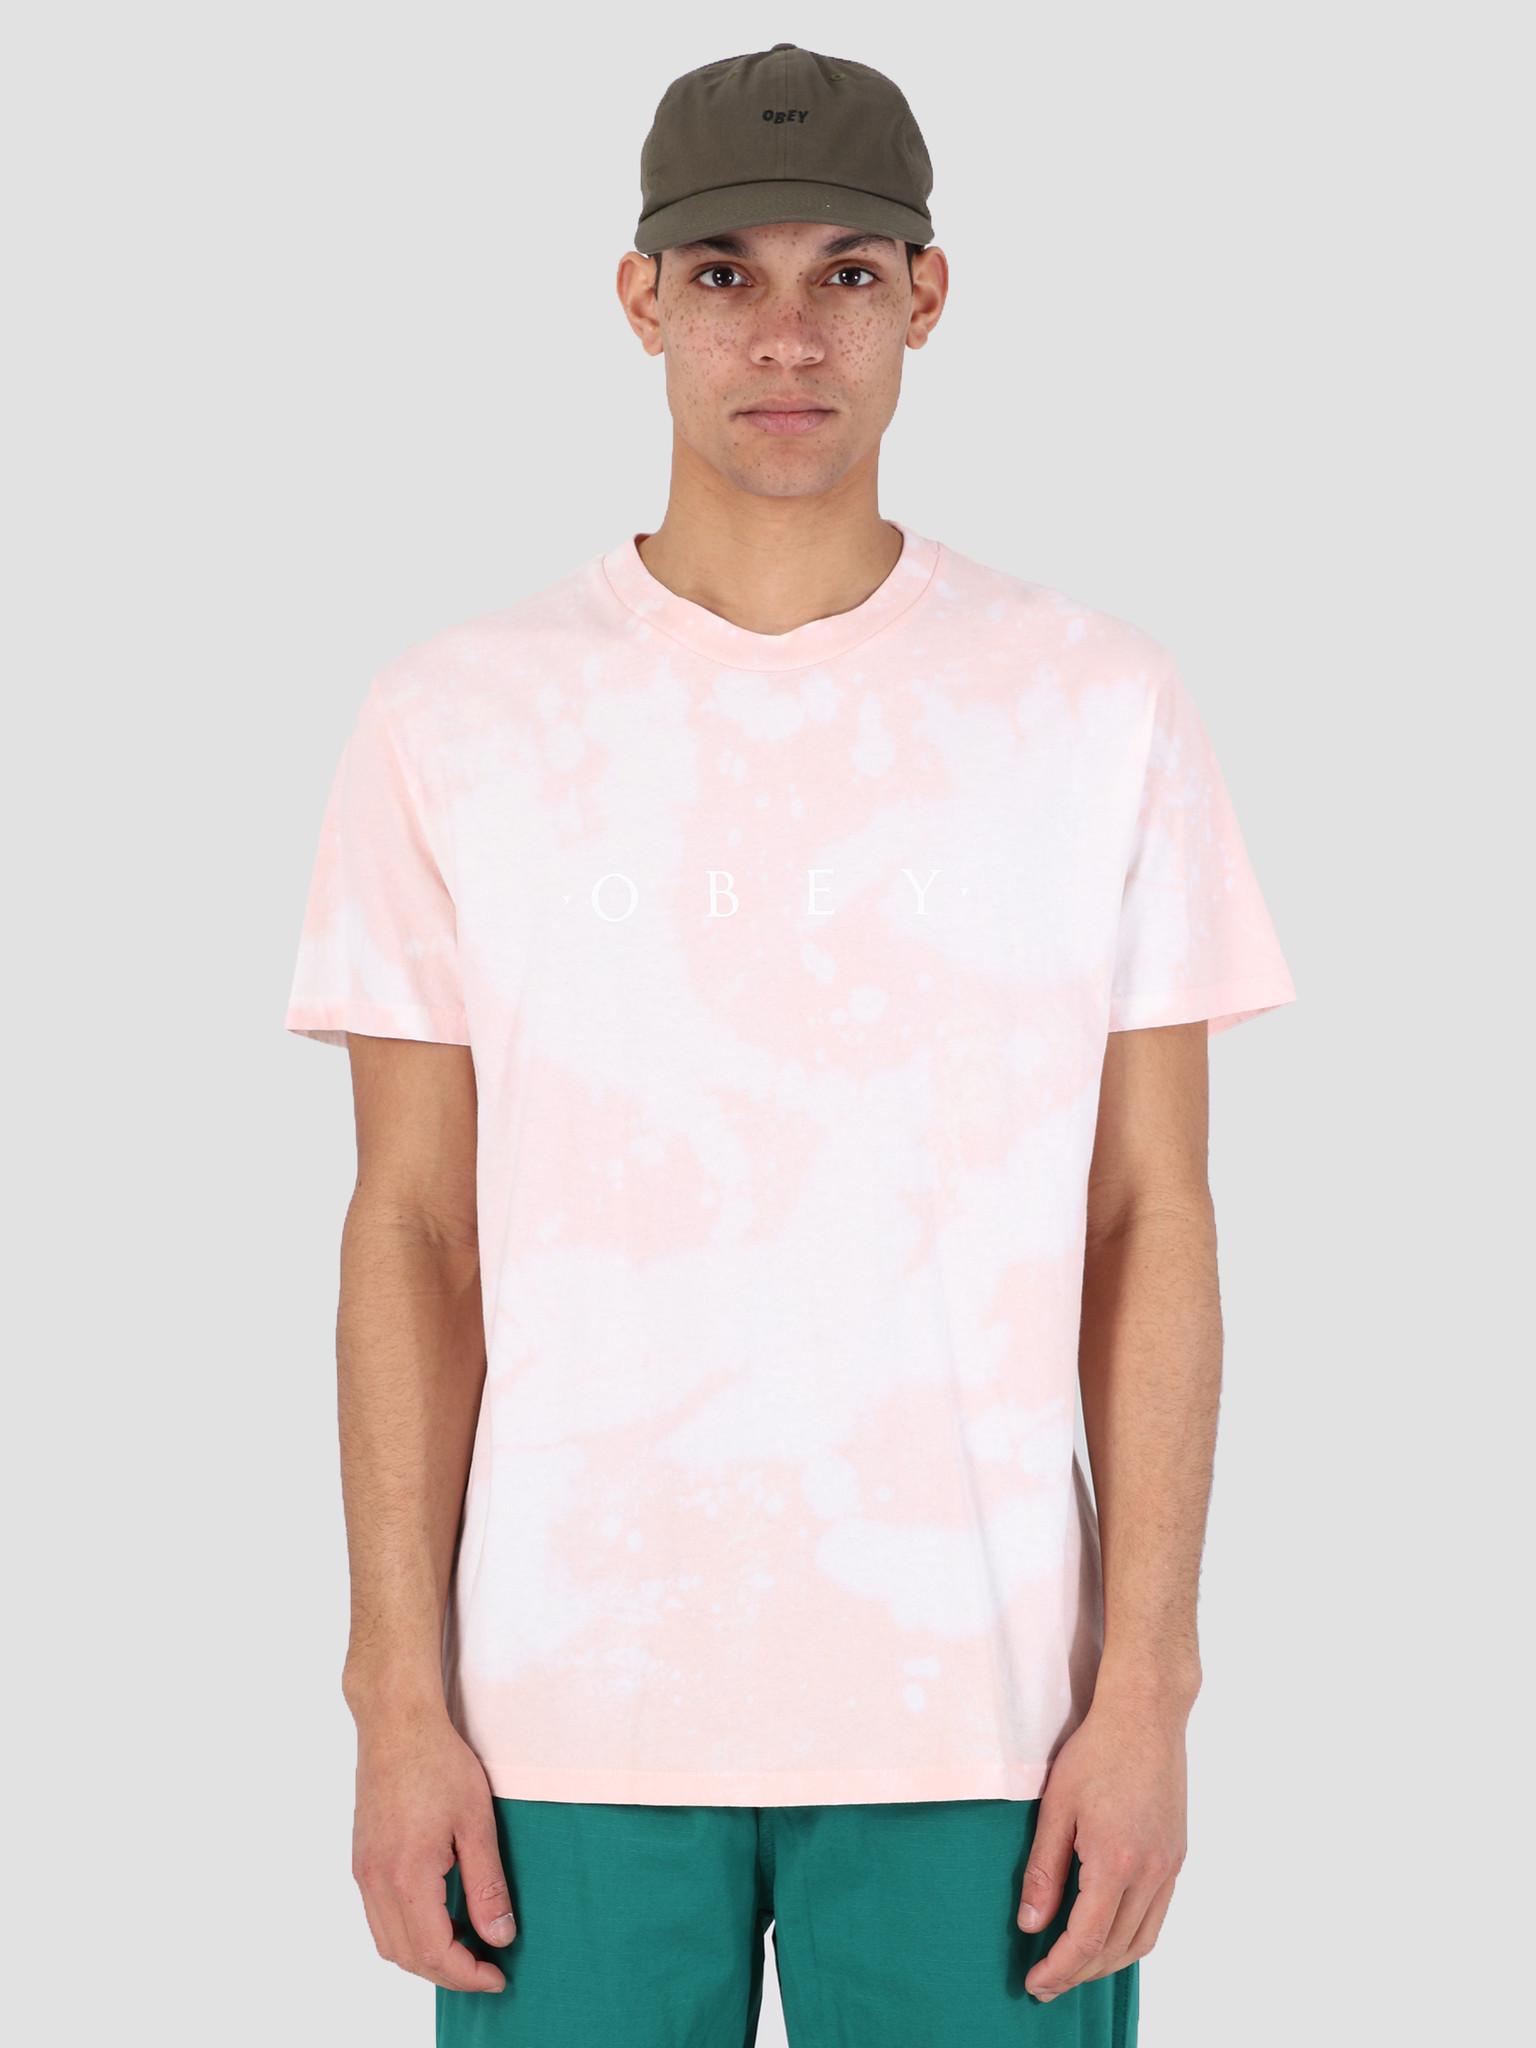 Obey Obey Novel Obey Tie Dye T-Shirt LRO 166741578